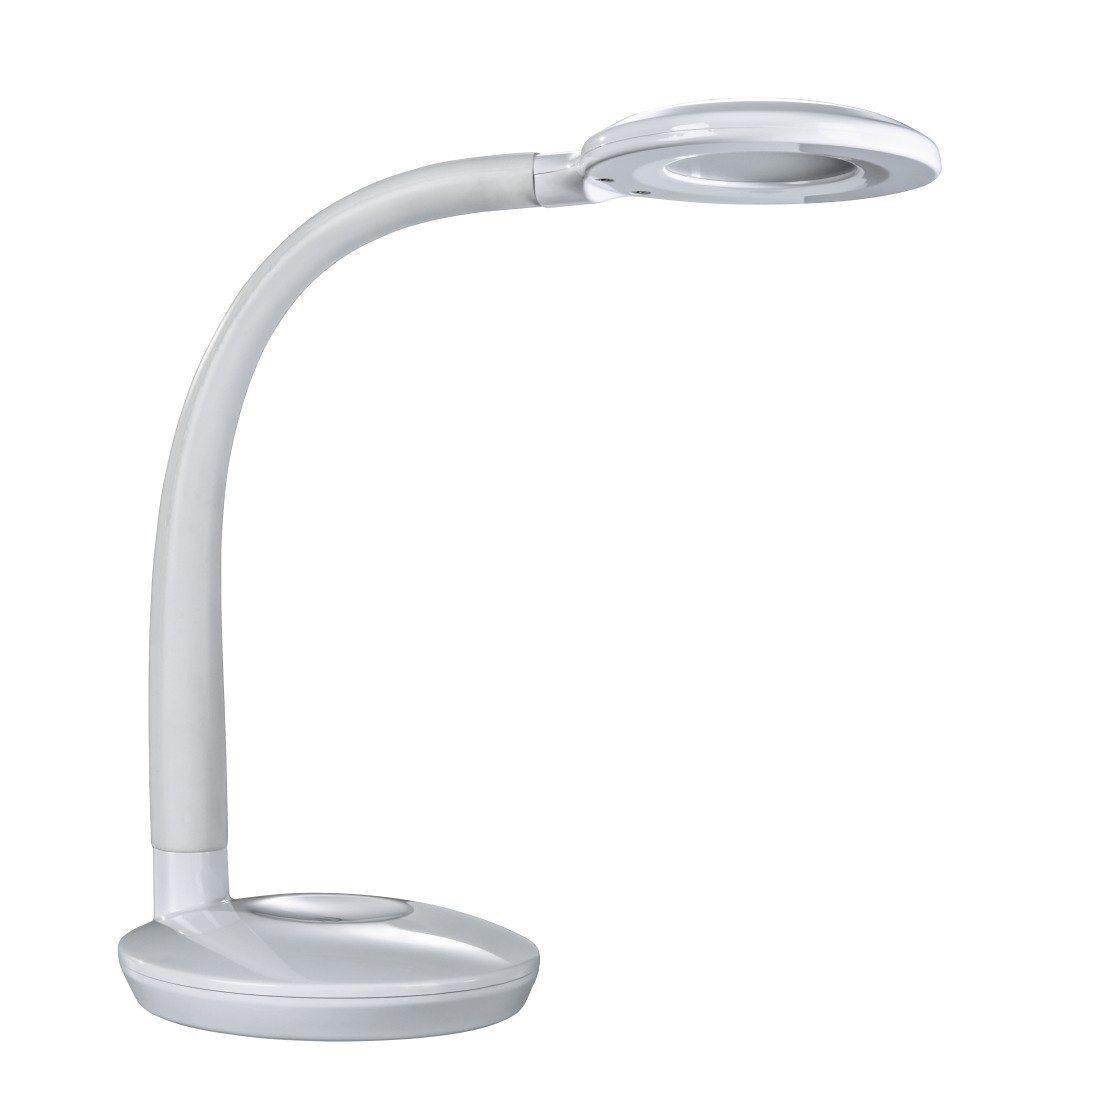 Hama LED Design Schreibtischlampe, dimmbare Touch Bürolampe, 5 W »flexibel drehbar & neigbar«